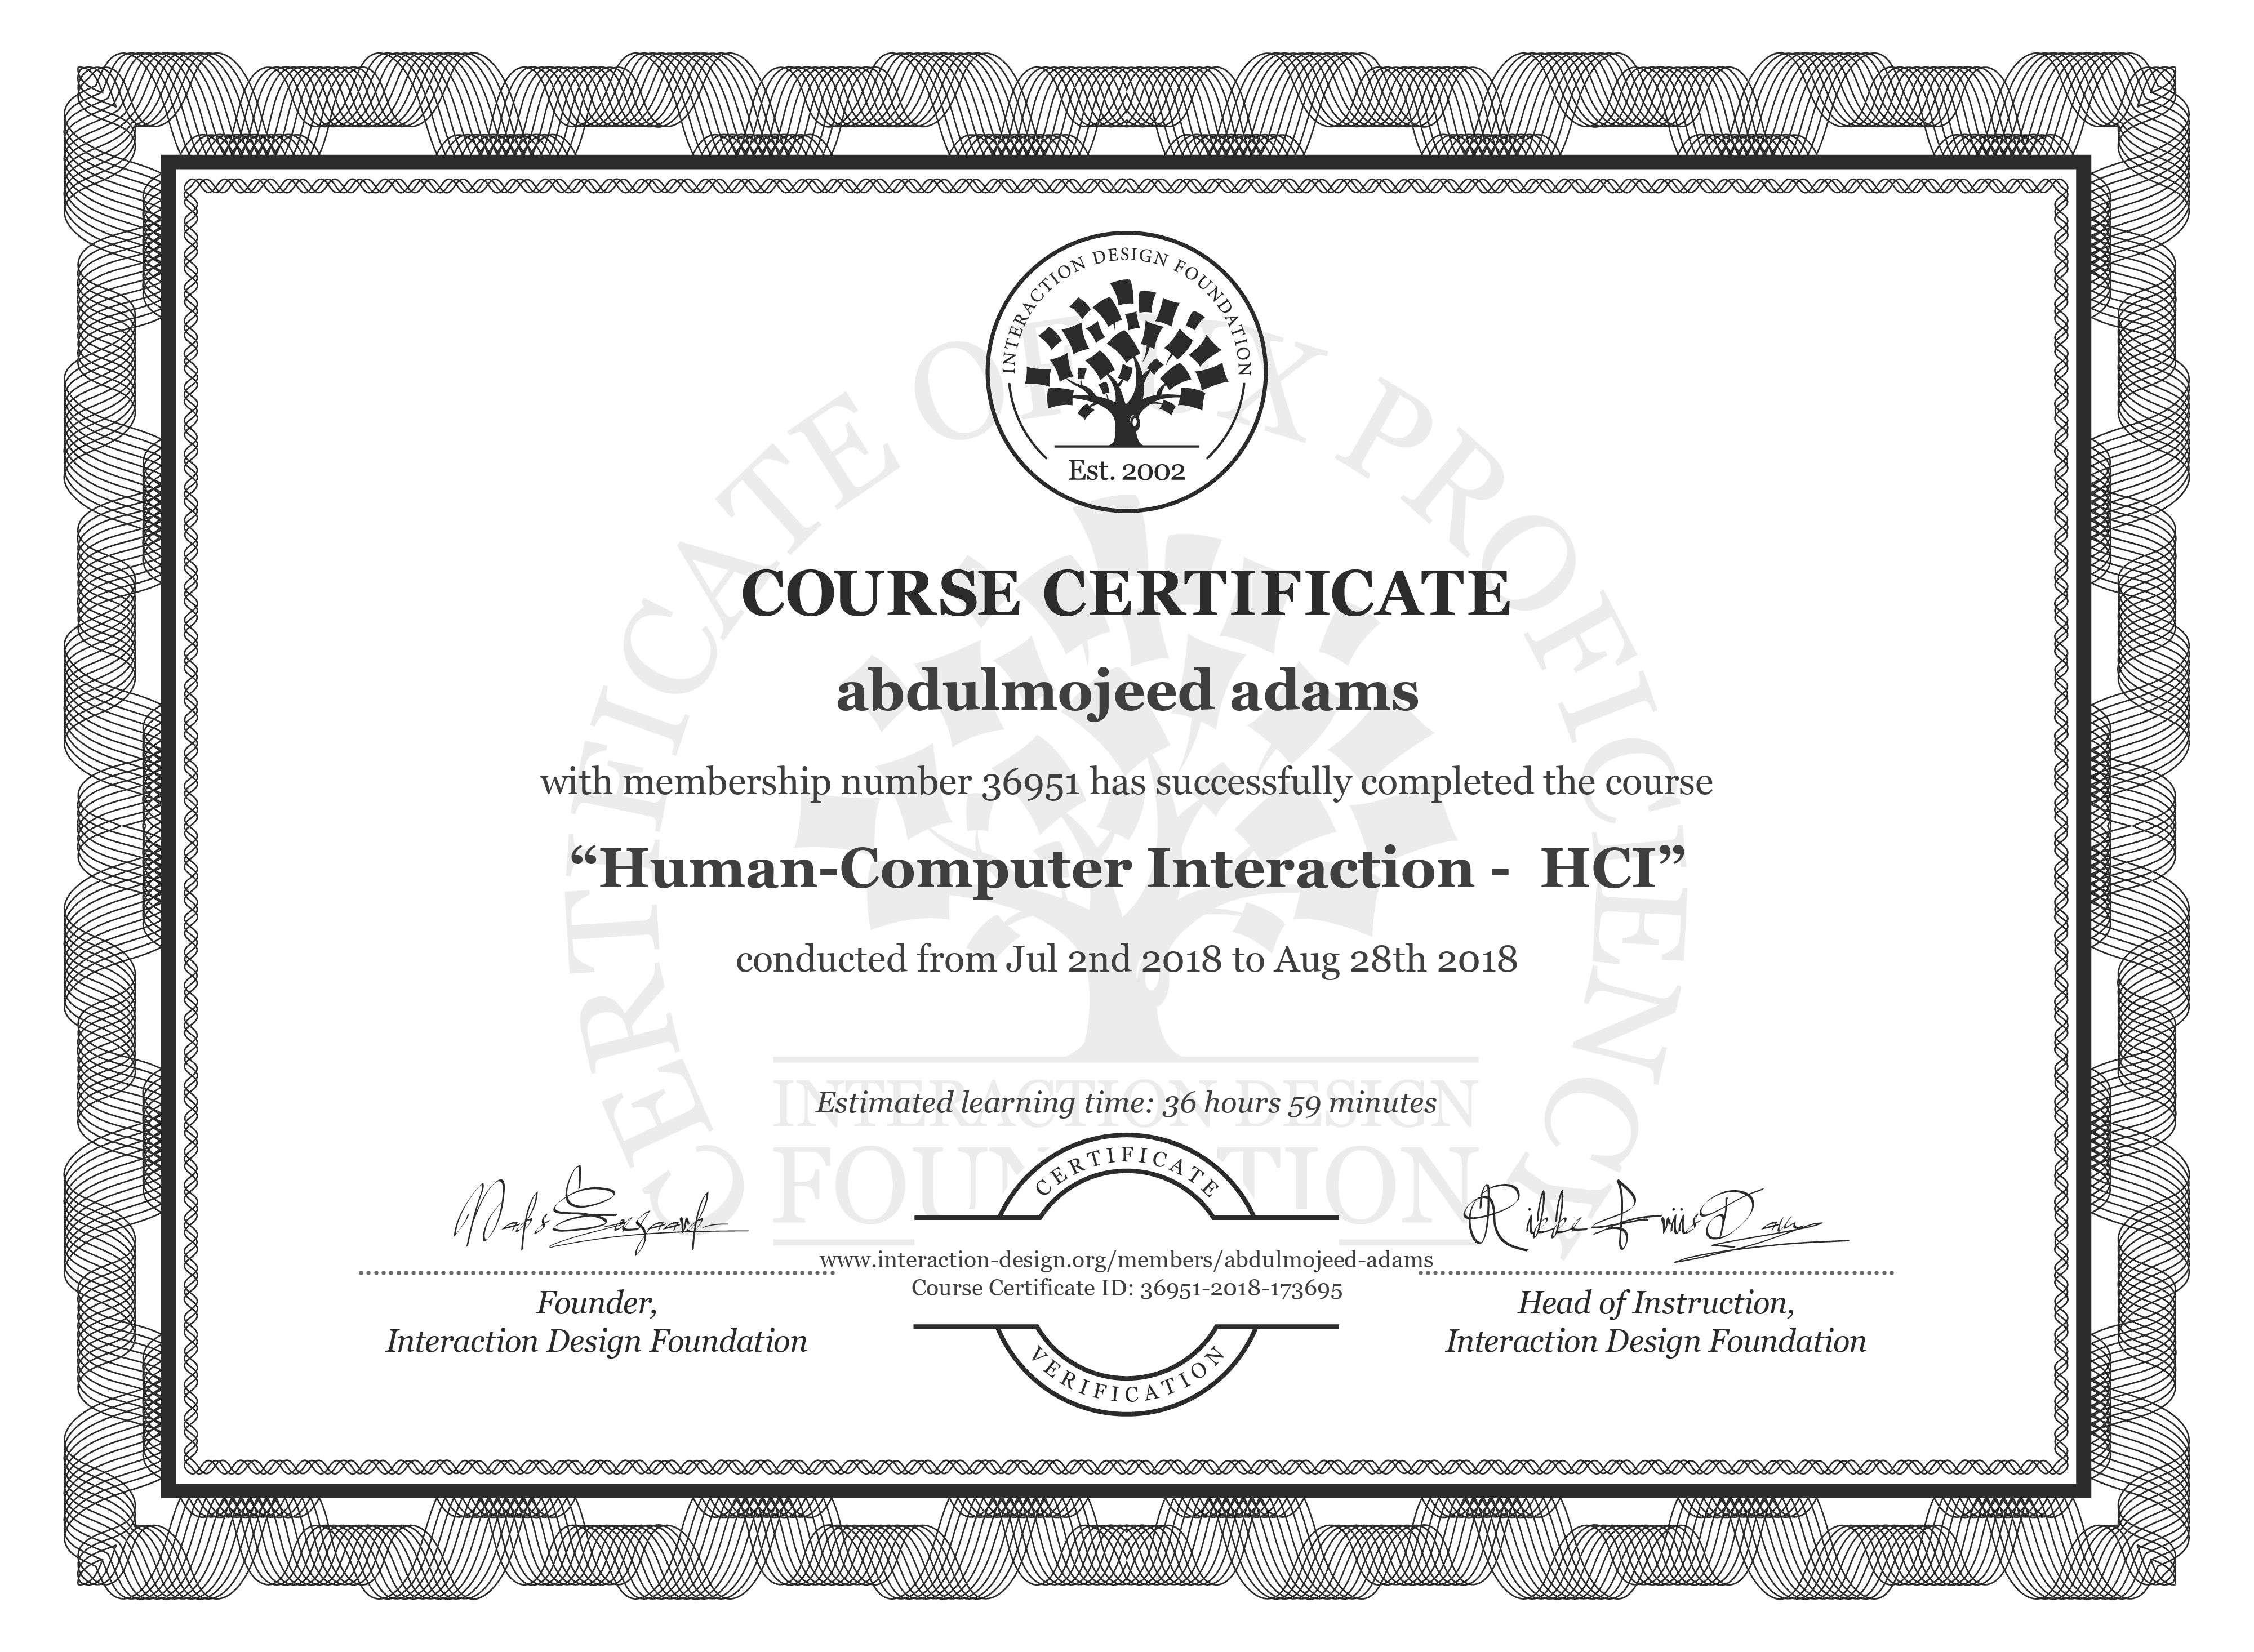 abdulmojeed adams: Course Certificate - Human-Computer Interaction -  HCI